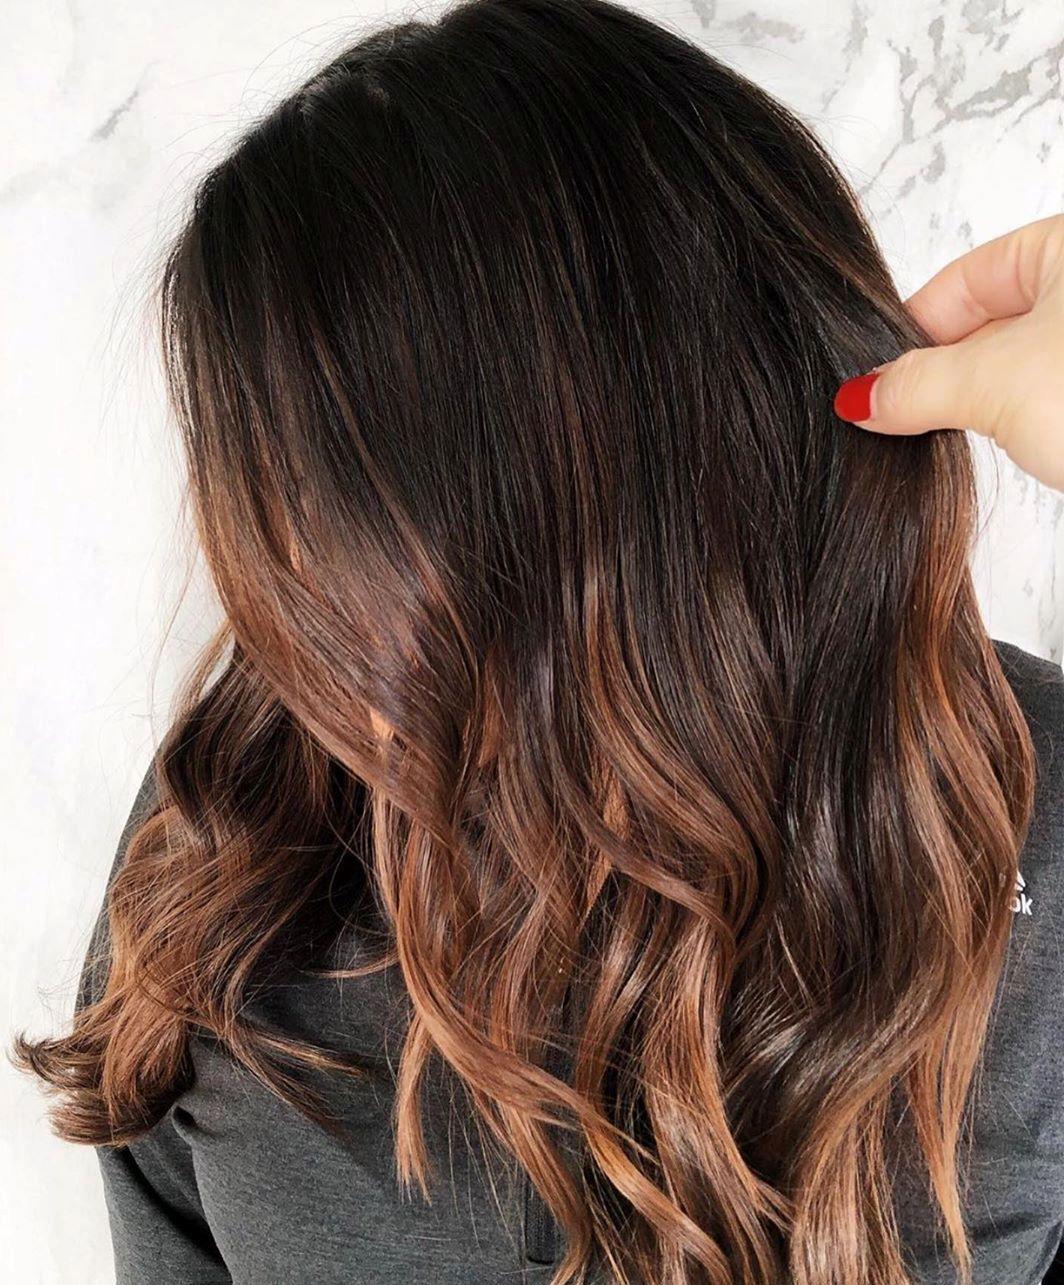 Honey Balayage for Brunette Hair